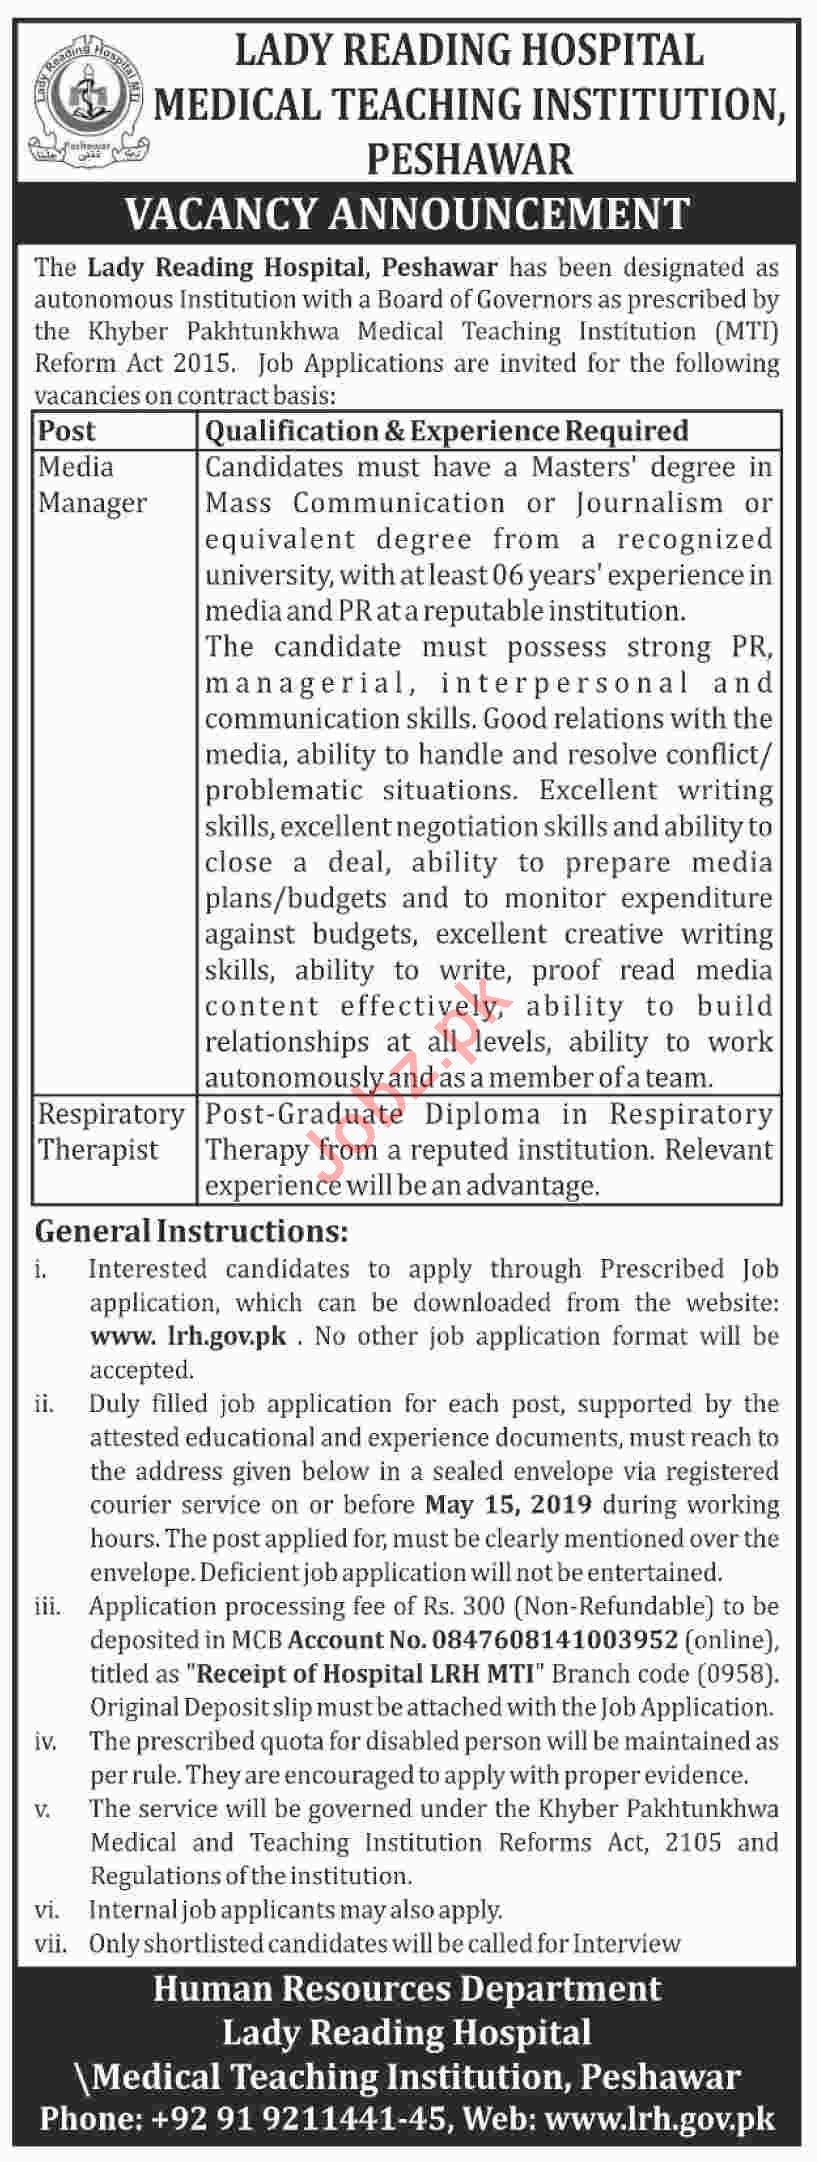 Lady Reading Hospital LRH Peshawar Jobs for Media Managers